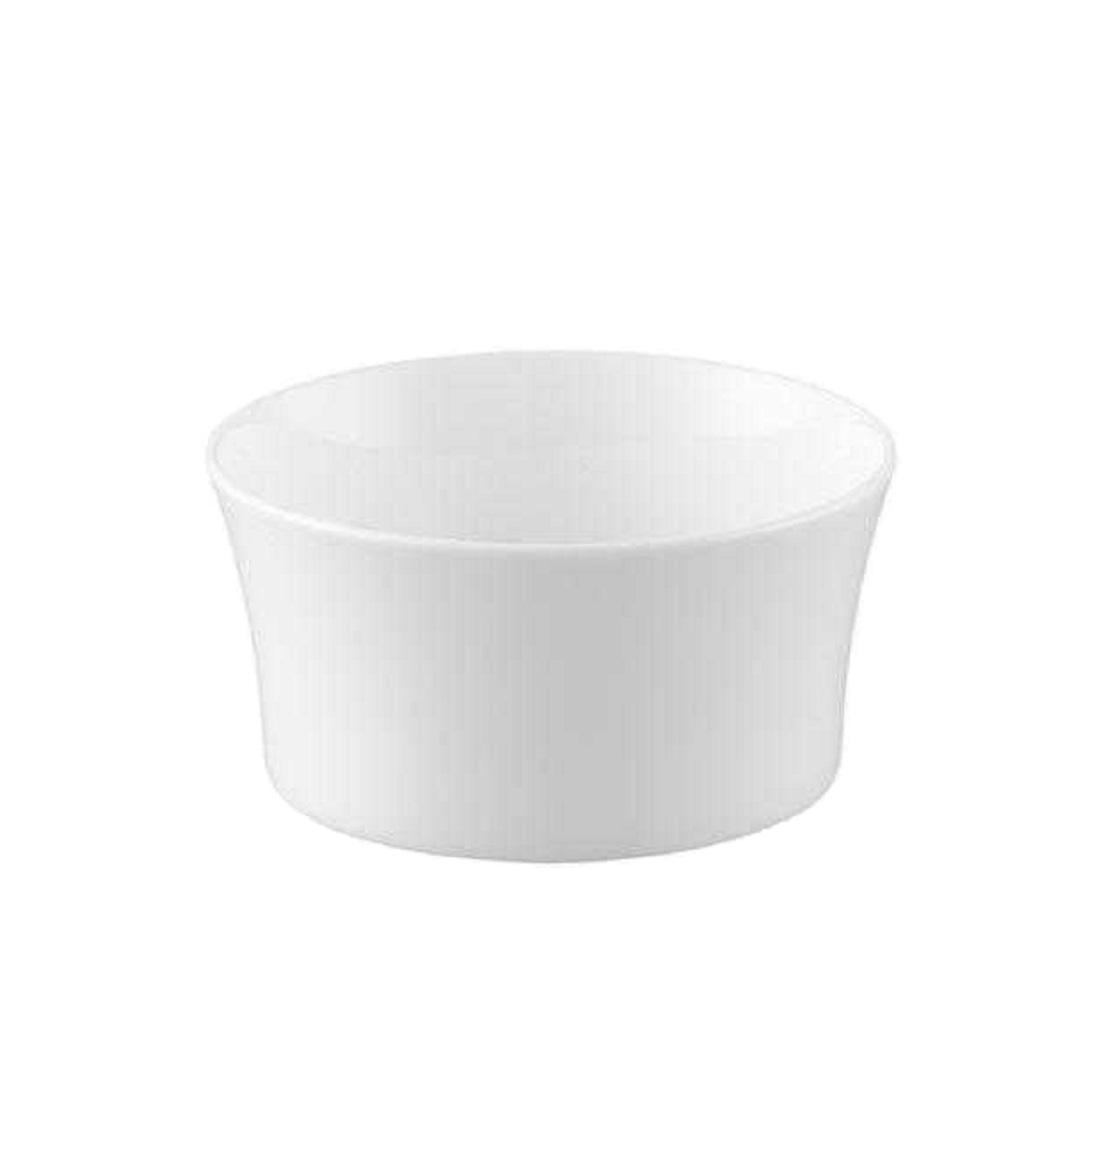 Онлайн каталог PROMENU: Пиала фарфоровая Rosenthal JADE, объем 0,35 л, белый Rosenthal 61040-800001-10430